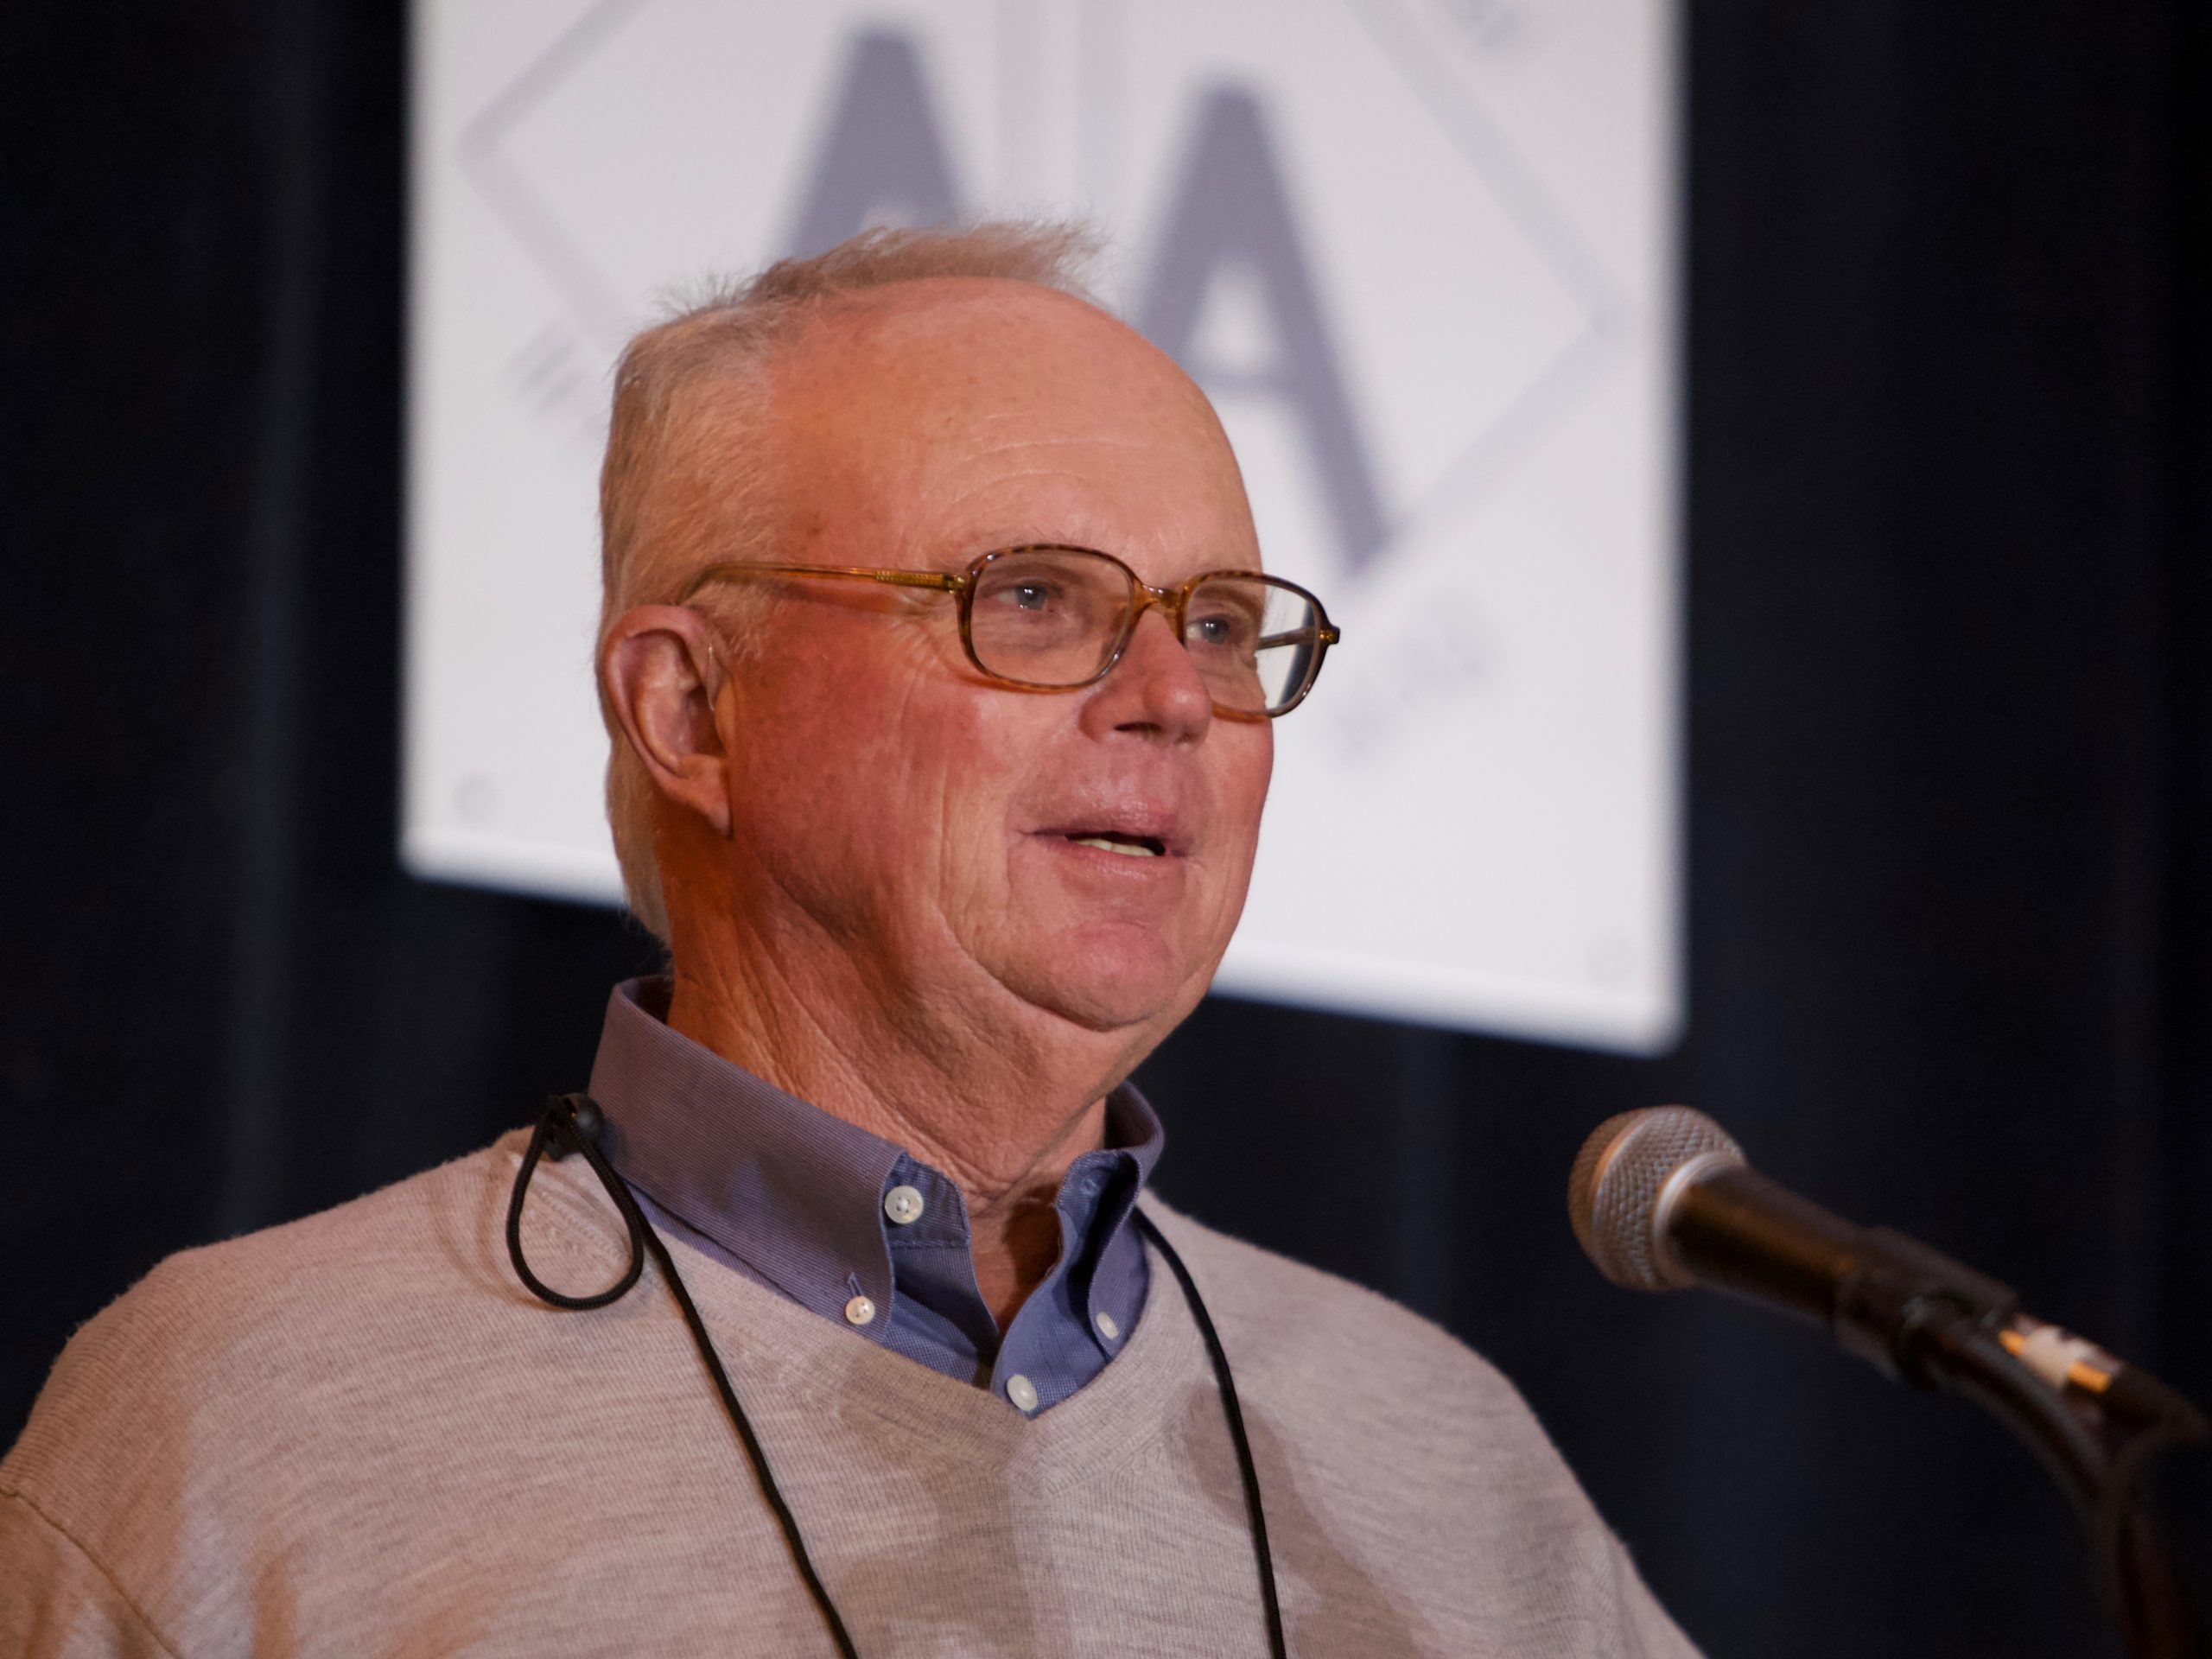 Ken Wanstrath accepts the 2019 IMAA Hall of Fame Award